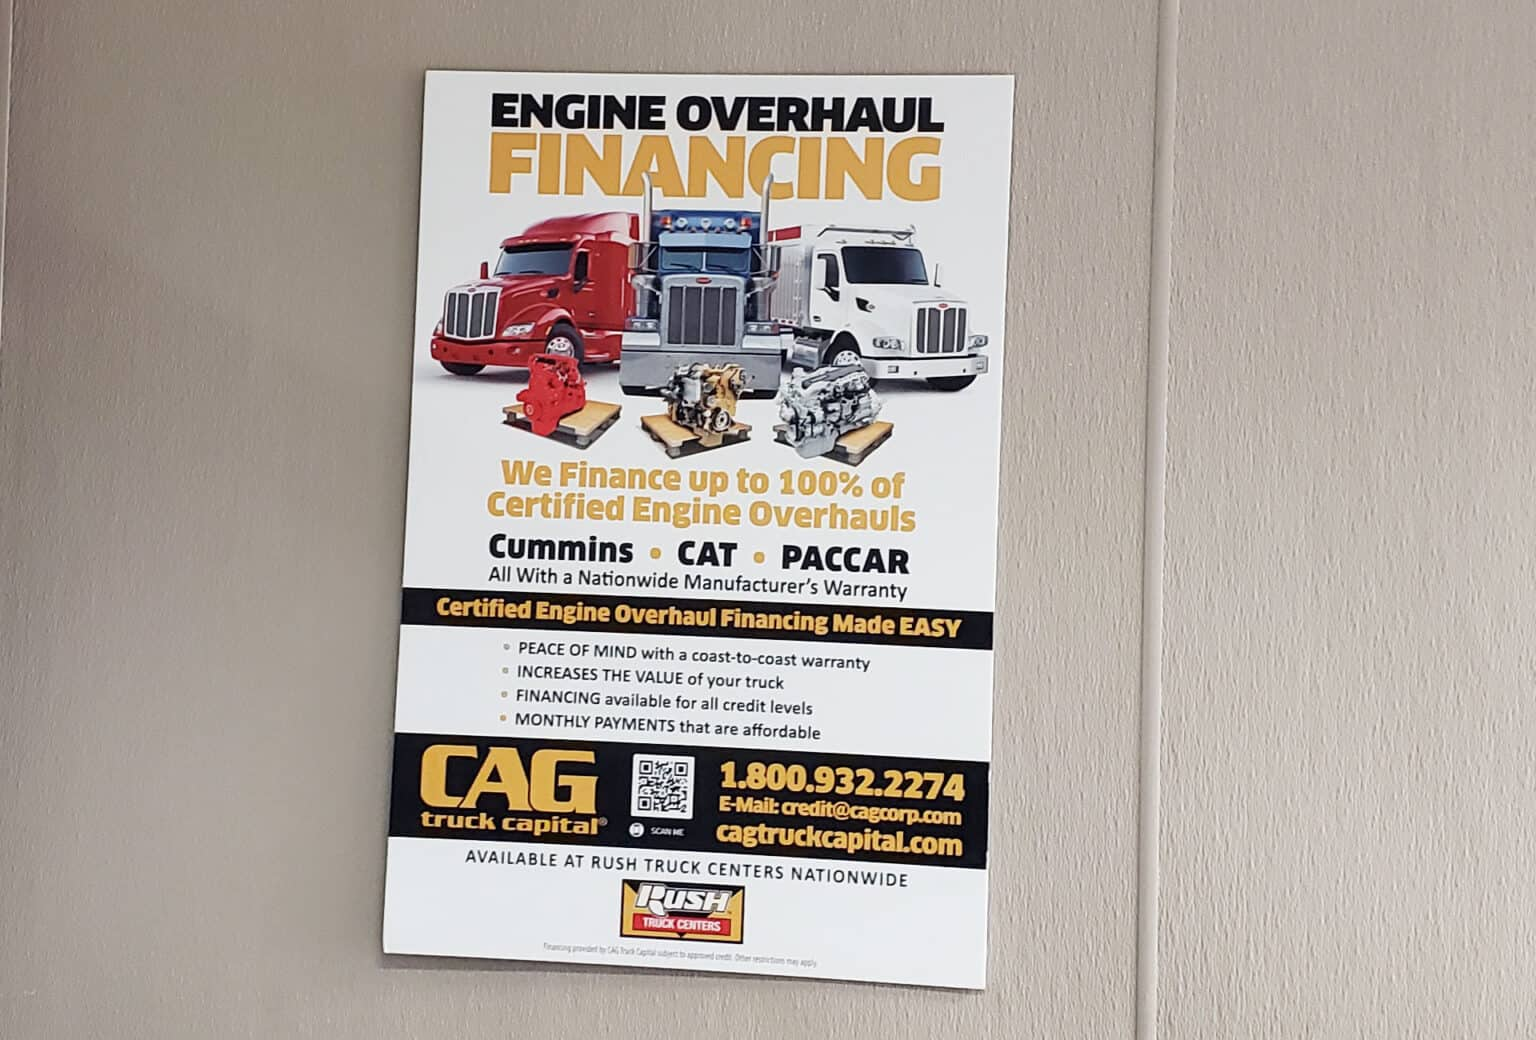 Rush Truck Centers Overhaul Locations In Dallas Texas TX